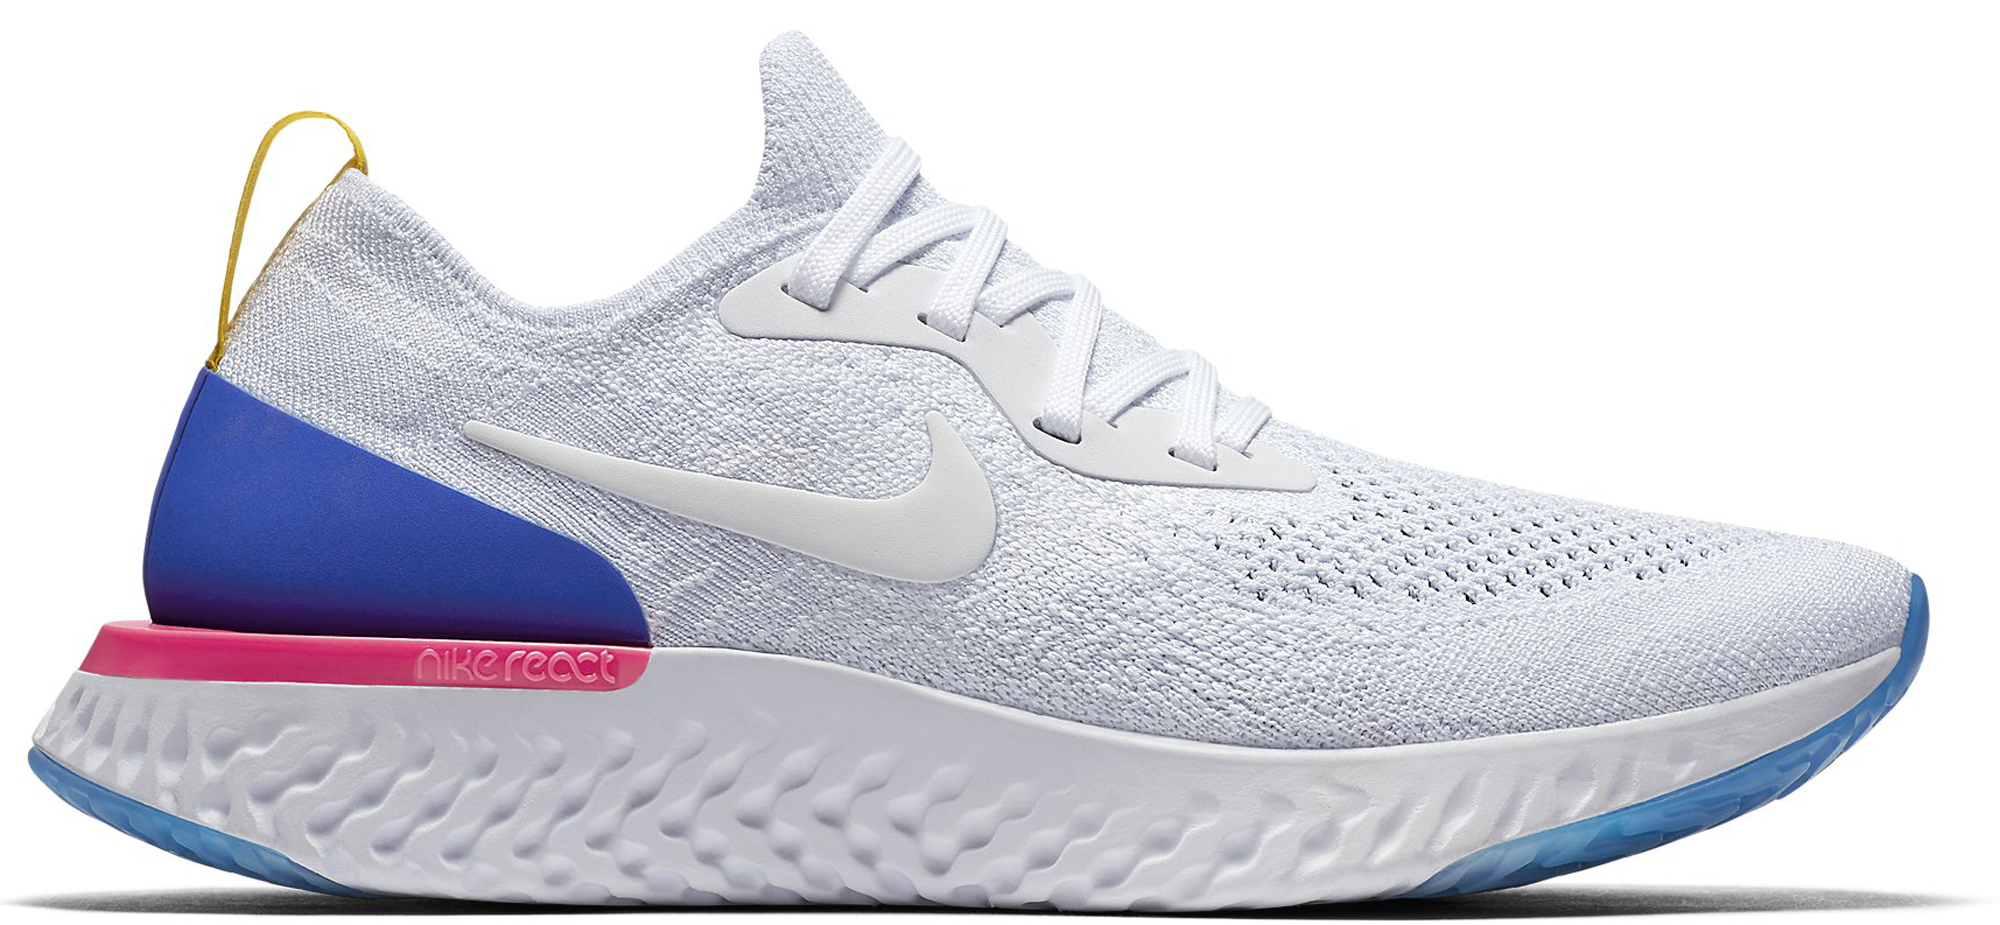 Nike Epic React Flyknit White Racer Blue Pink Blast (W)